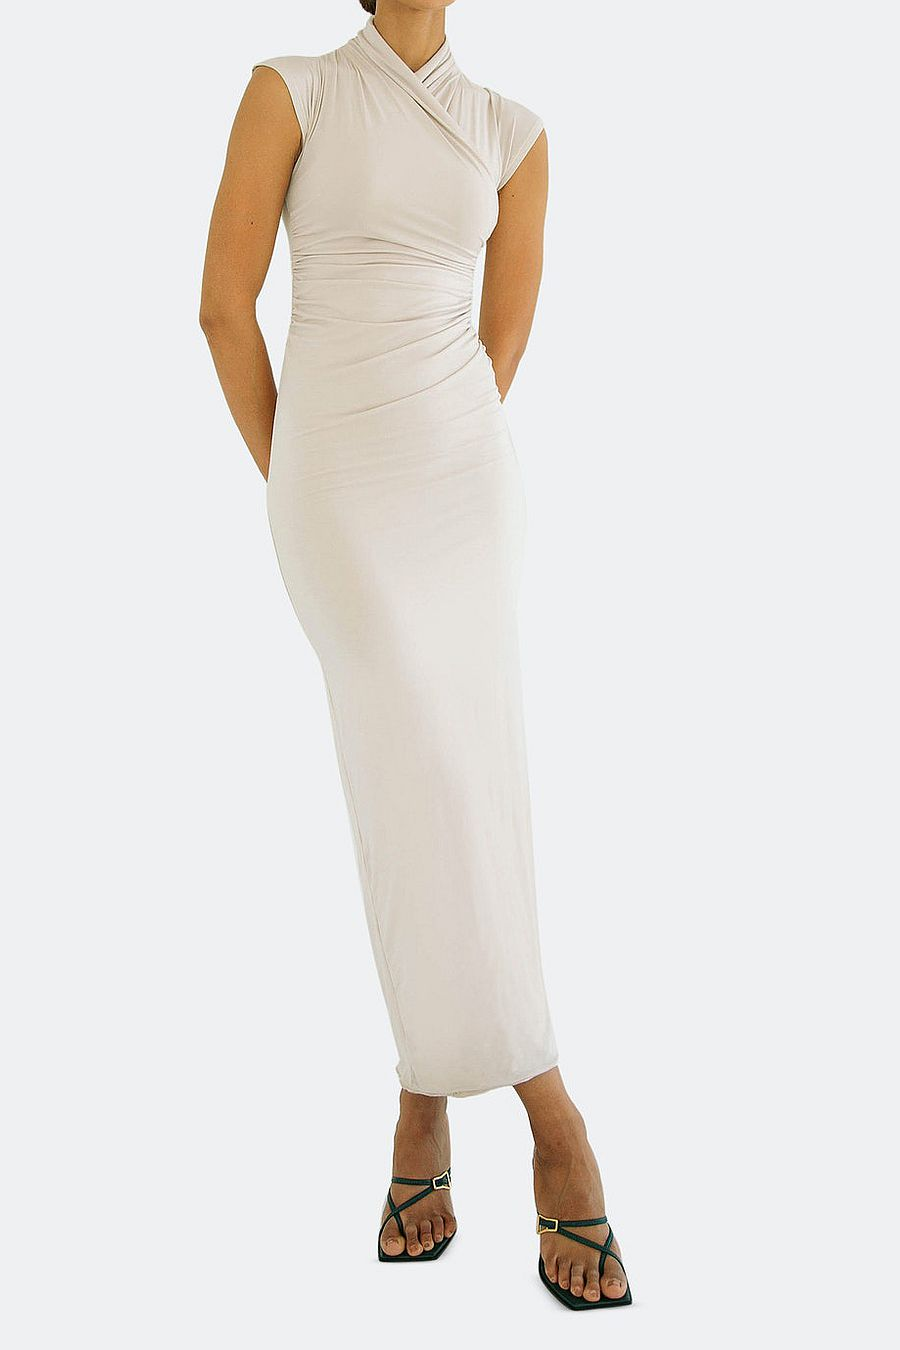 The Line by K Sinea Dress - Clay